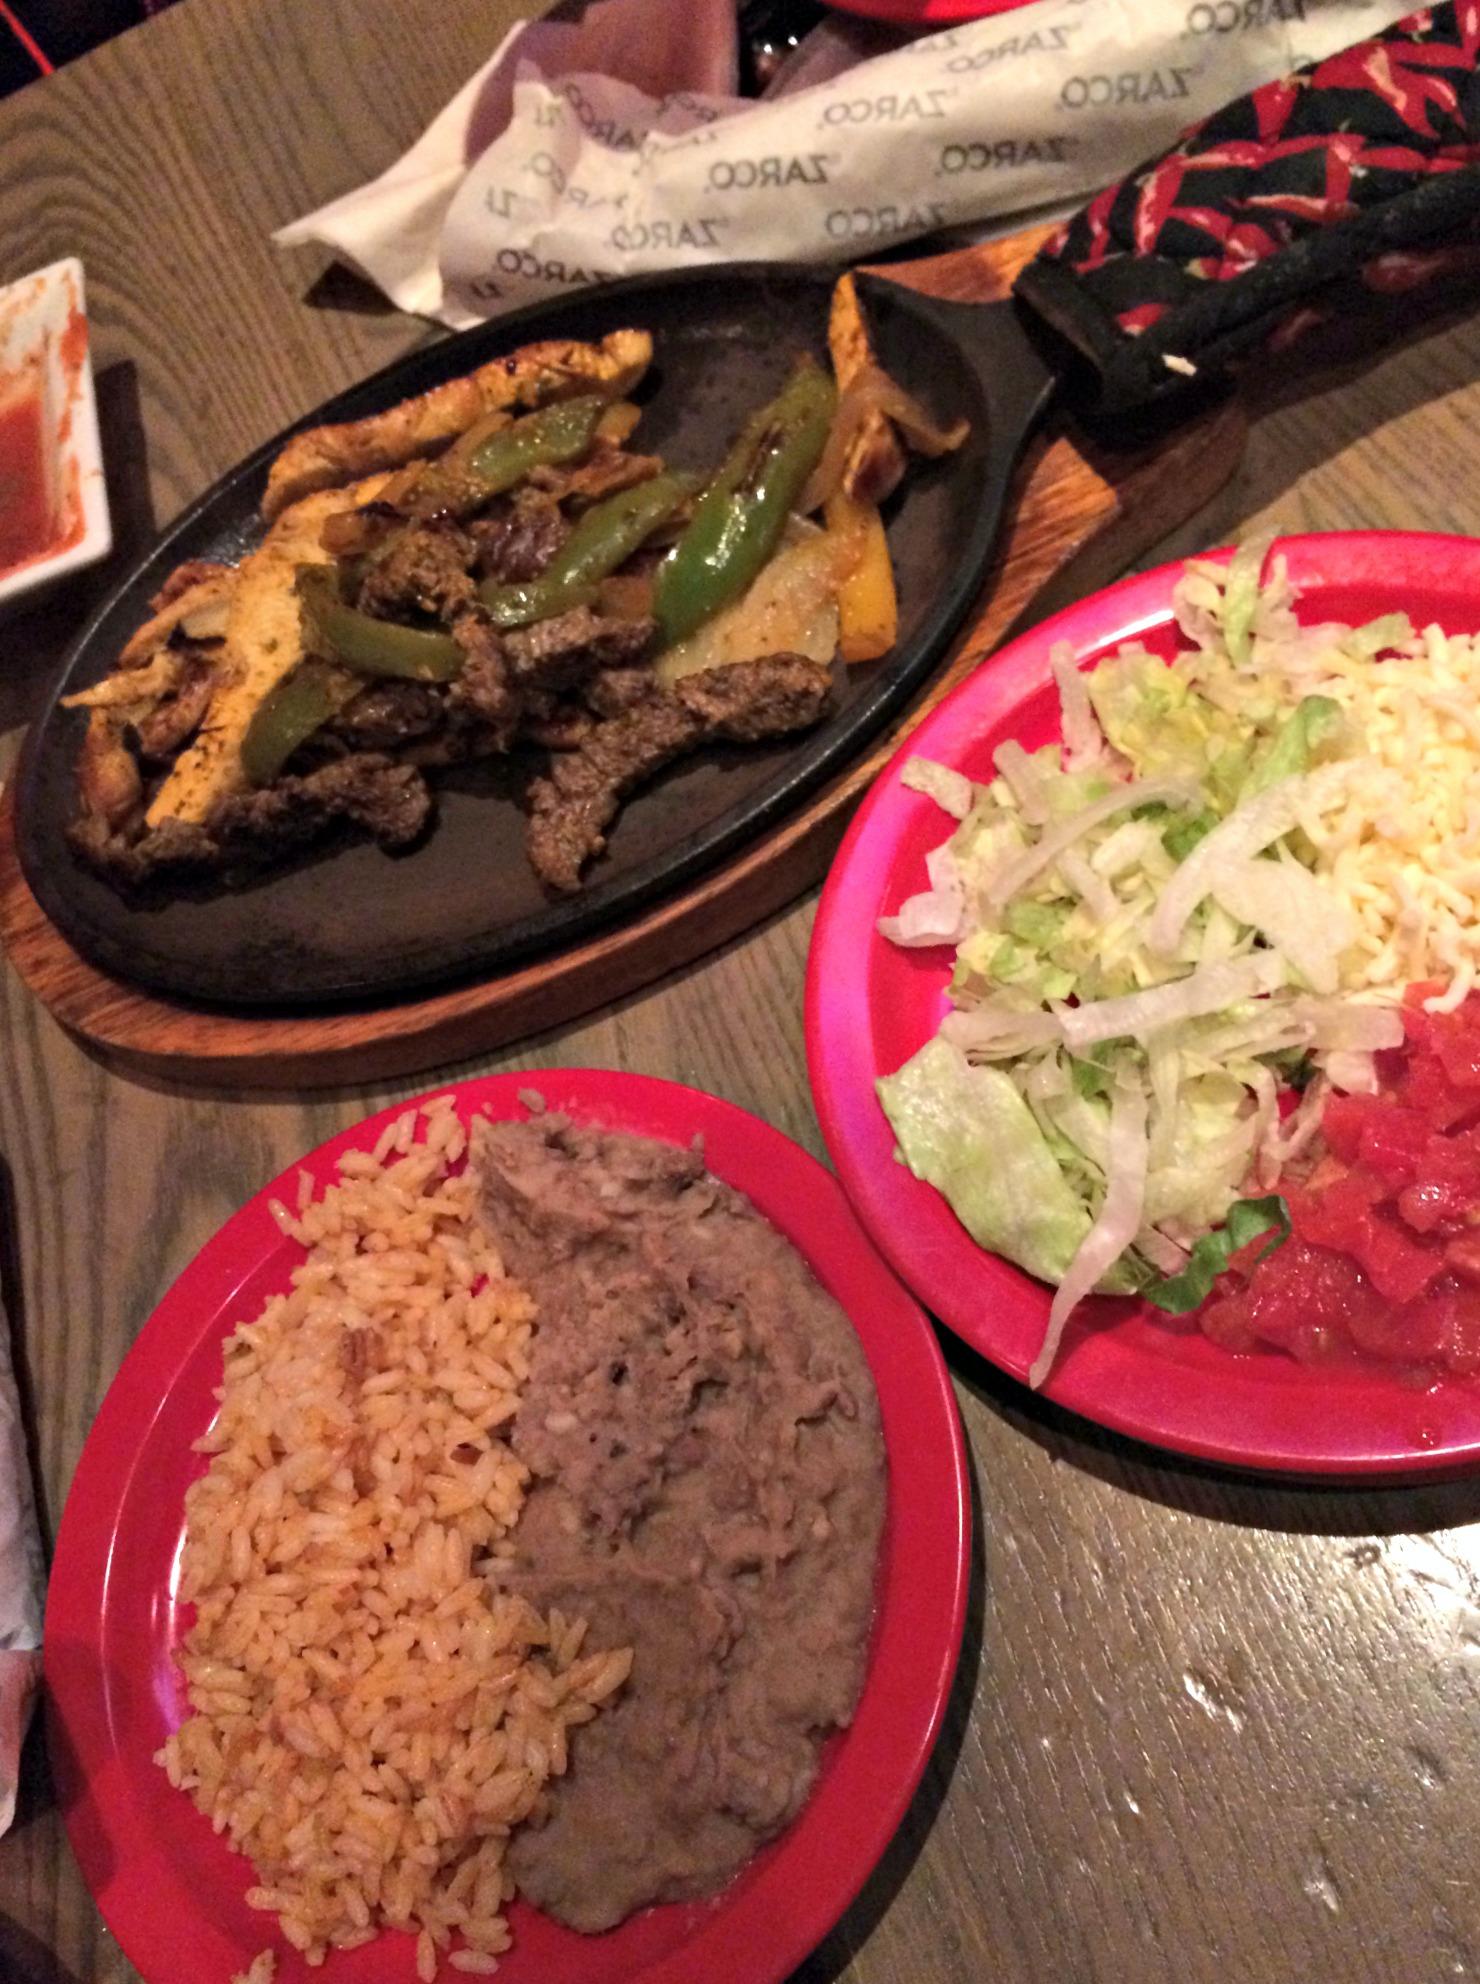 Rojo chicken and steak fajitas